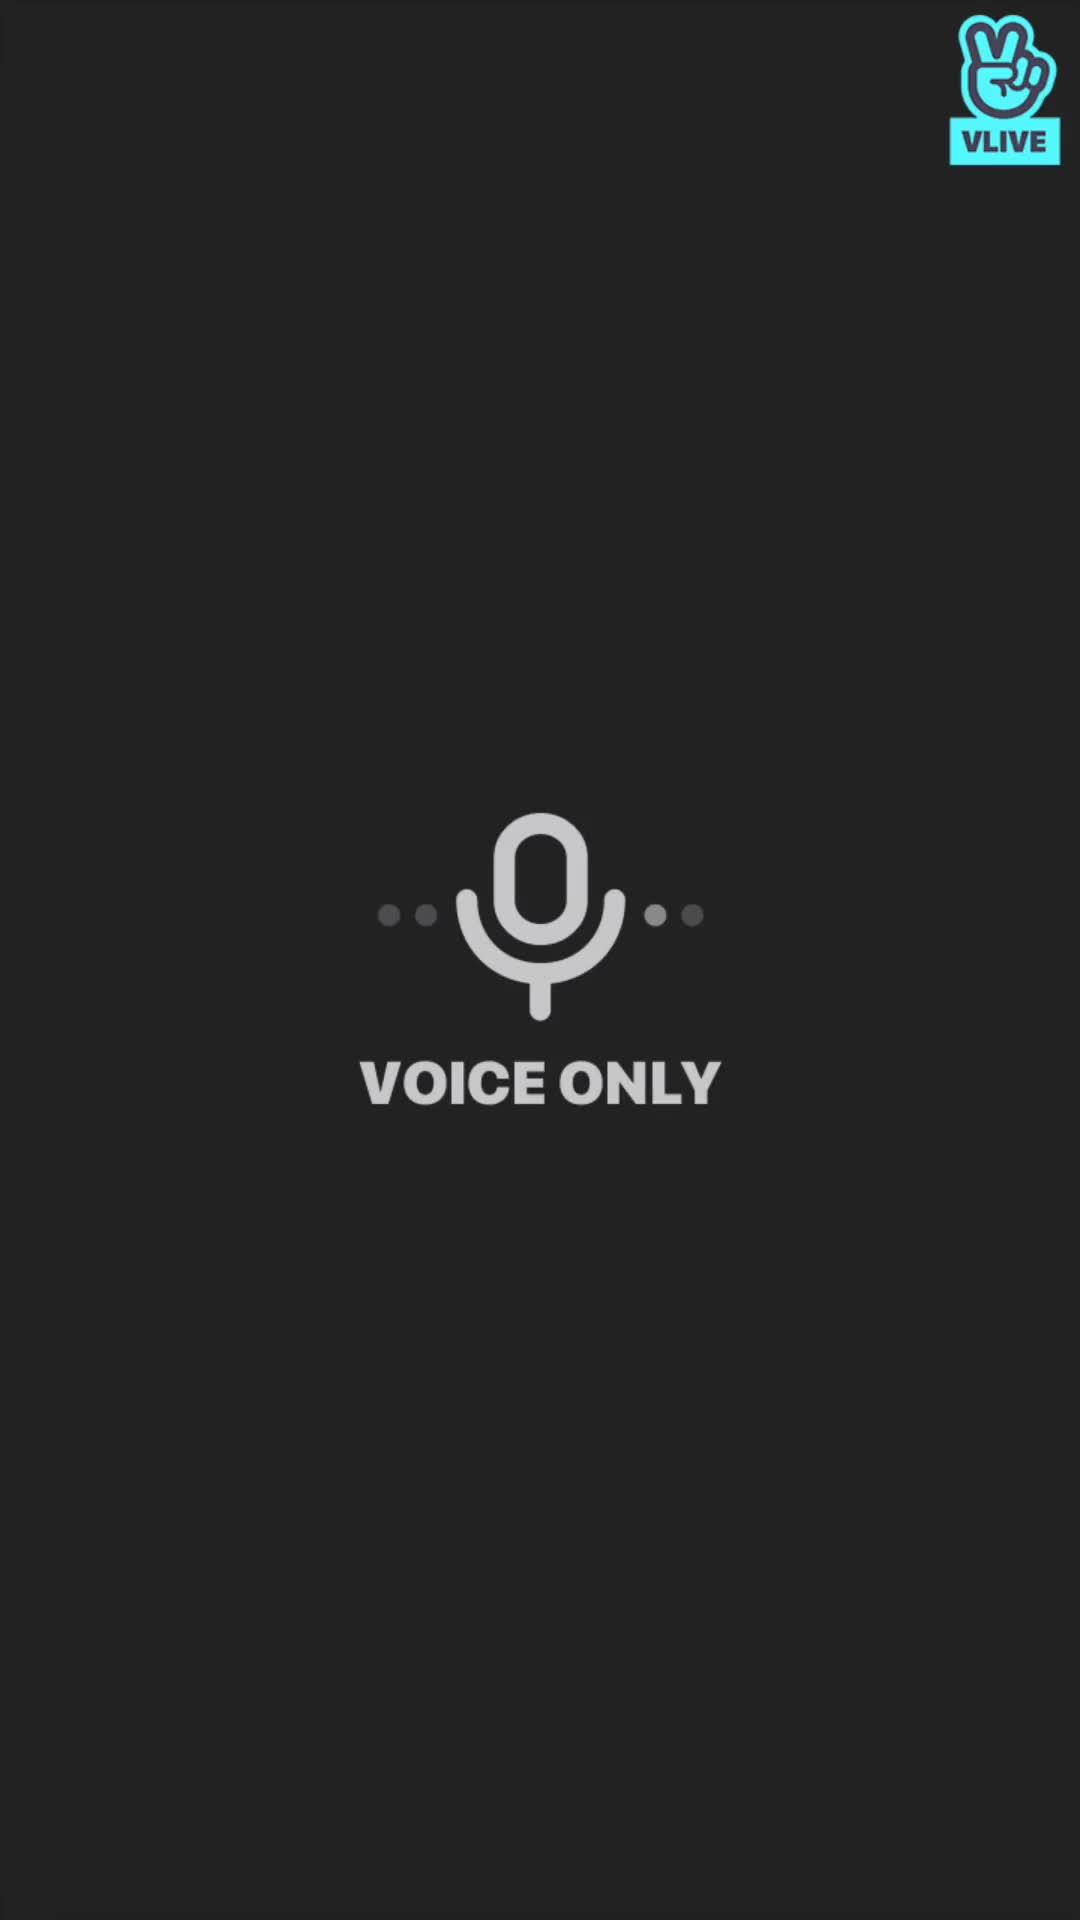 [RADIO] 캐럿들 귀대귀대 #83DINO⭐️